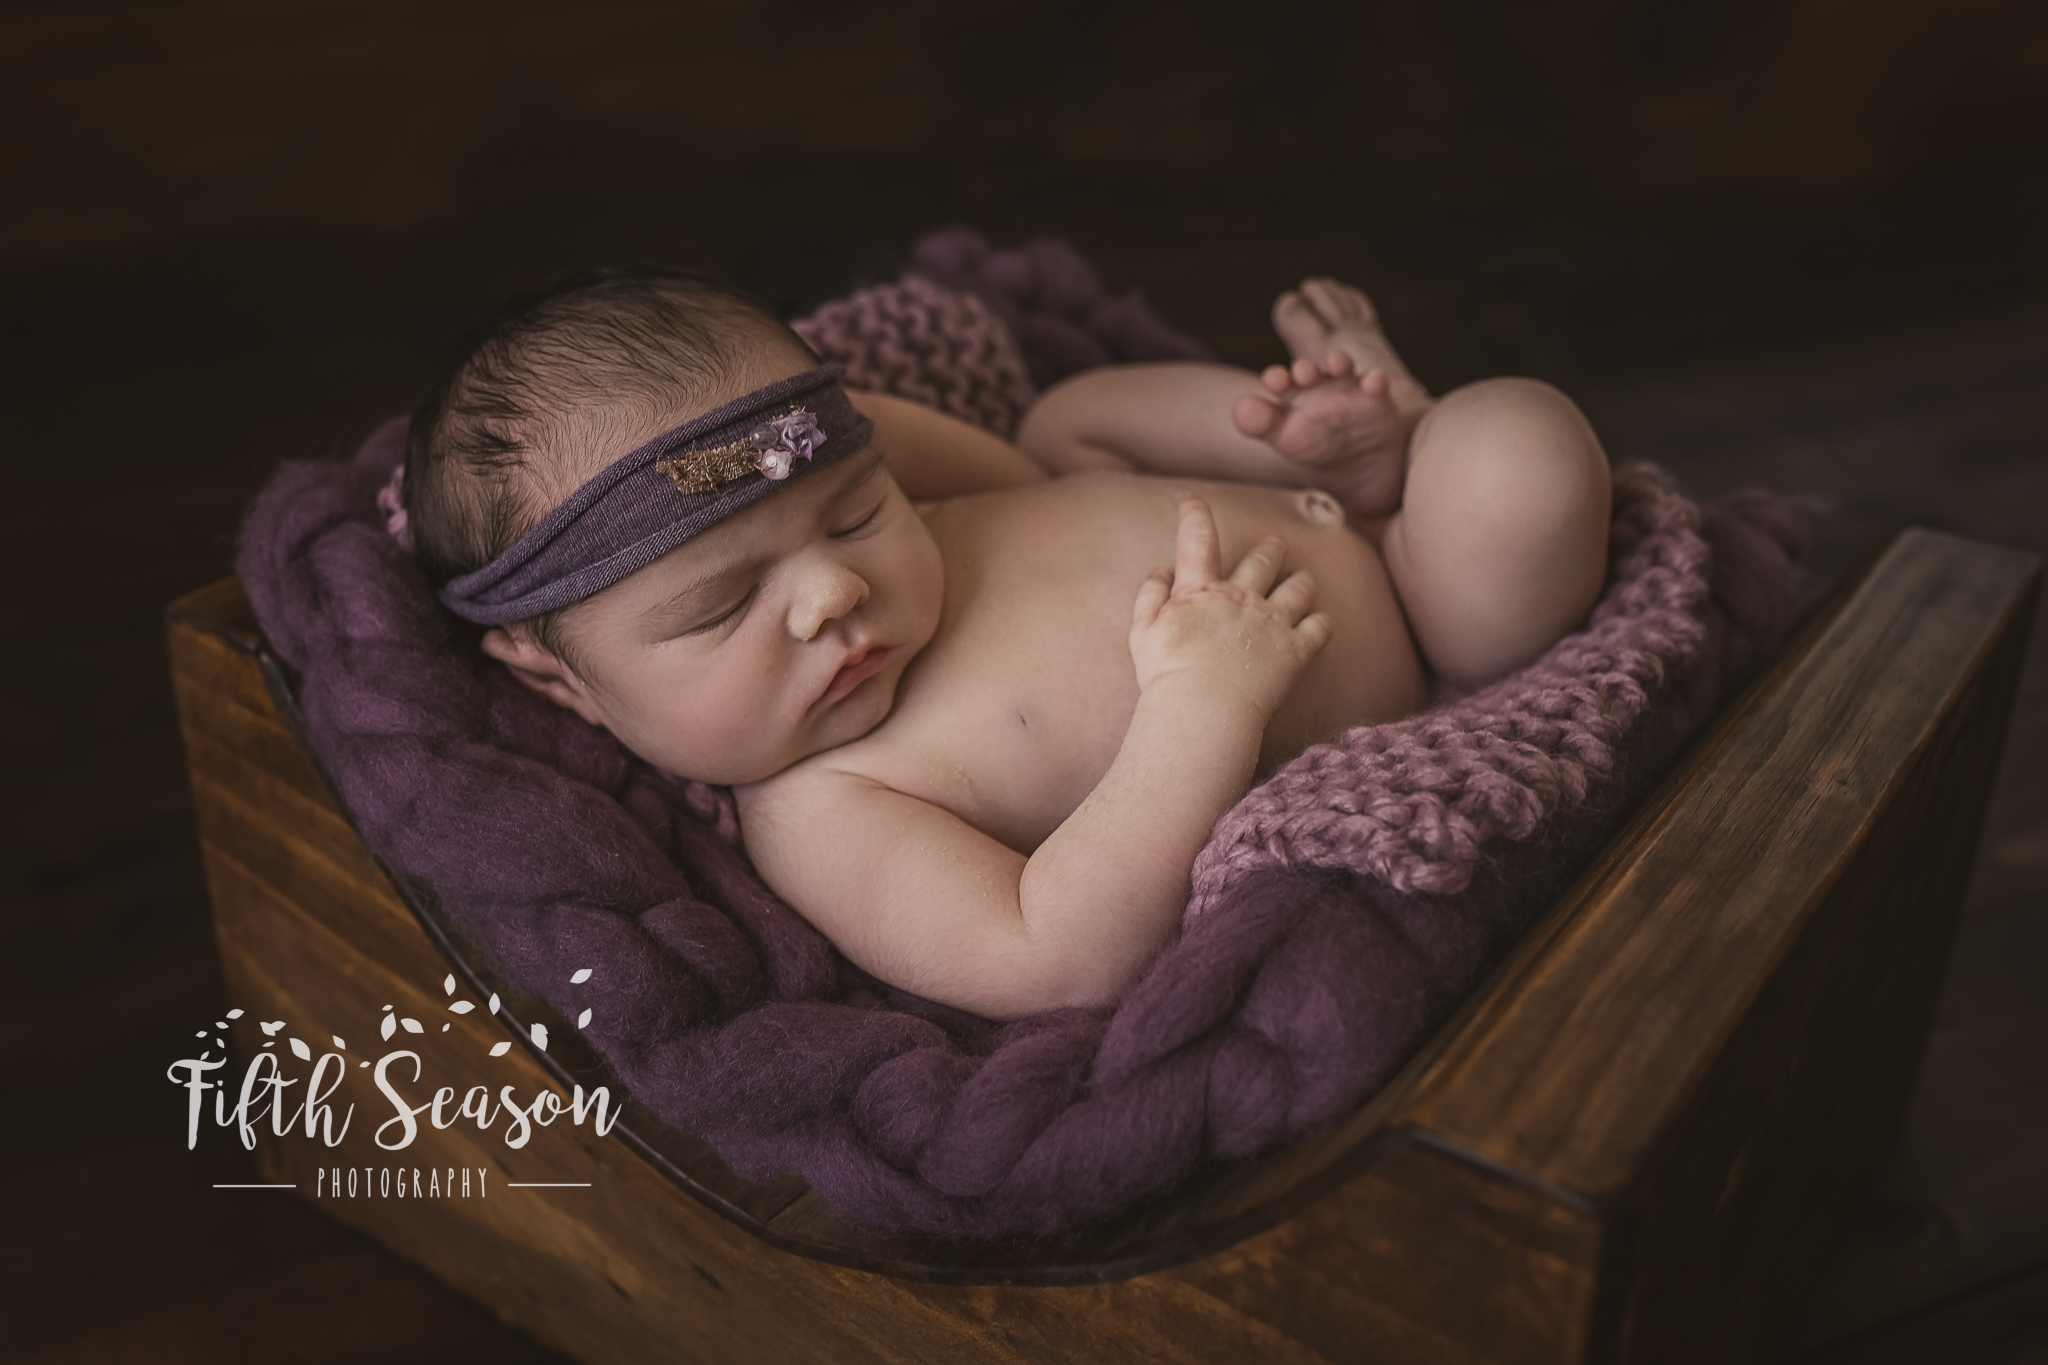 Fifth Season Photography, Mandurah, Perth, Western Australia, Newborn, Children, Family, Portraits, Photography